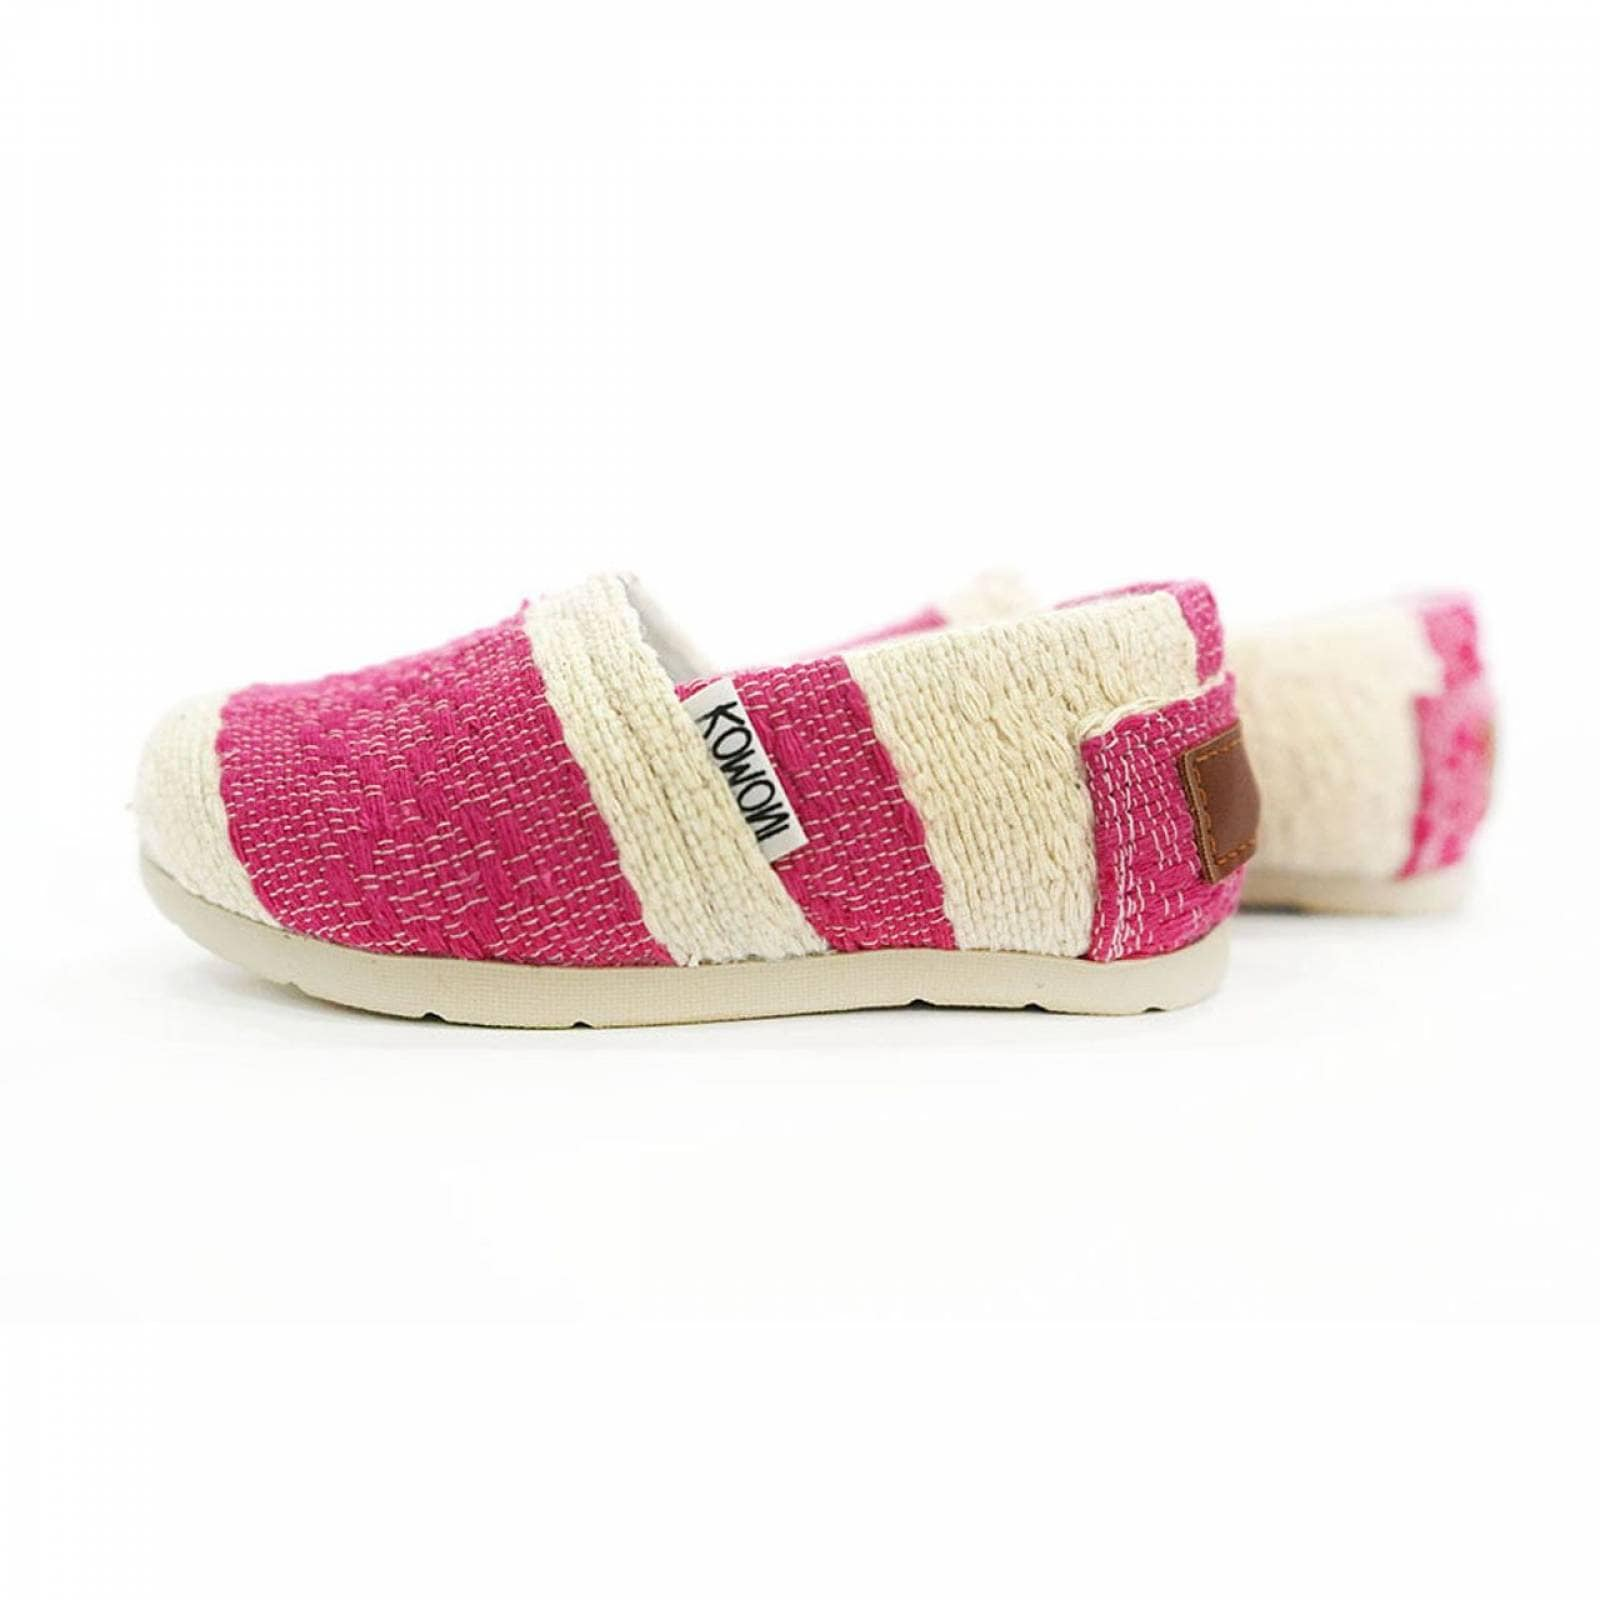 Zapato Alpargata Mini Jacinta Artesanal Tela Infantil Rosa Komoni Talla: 16